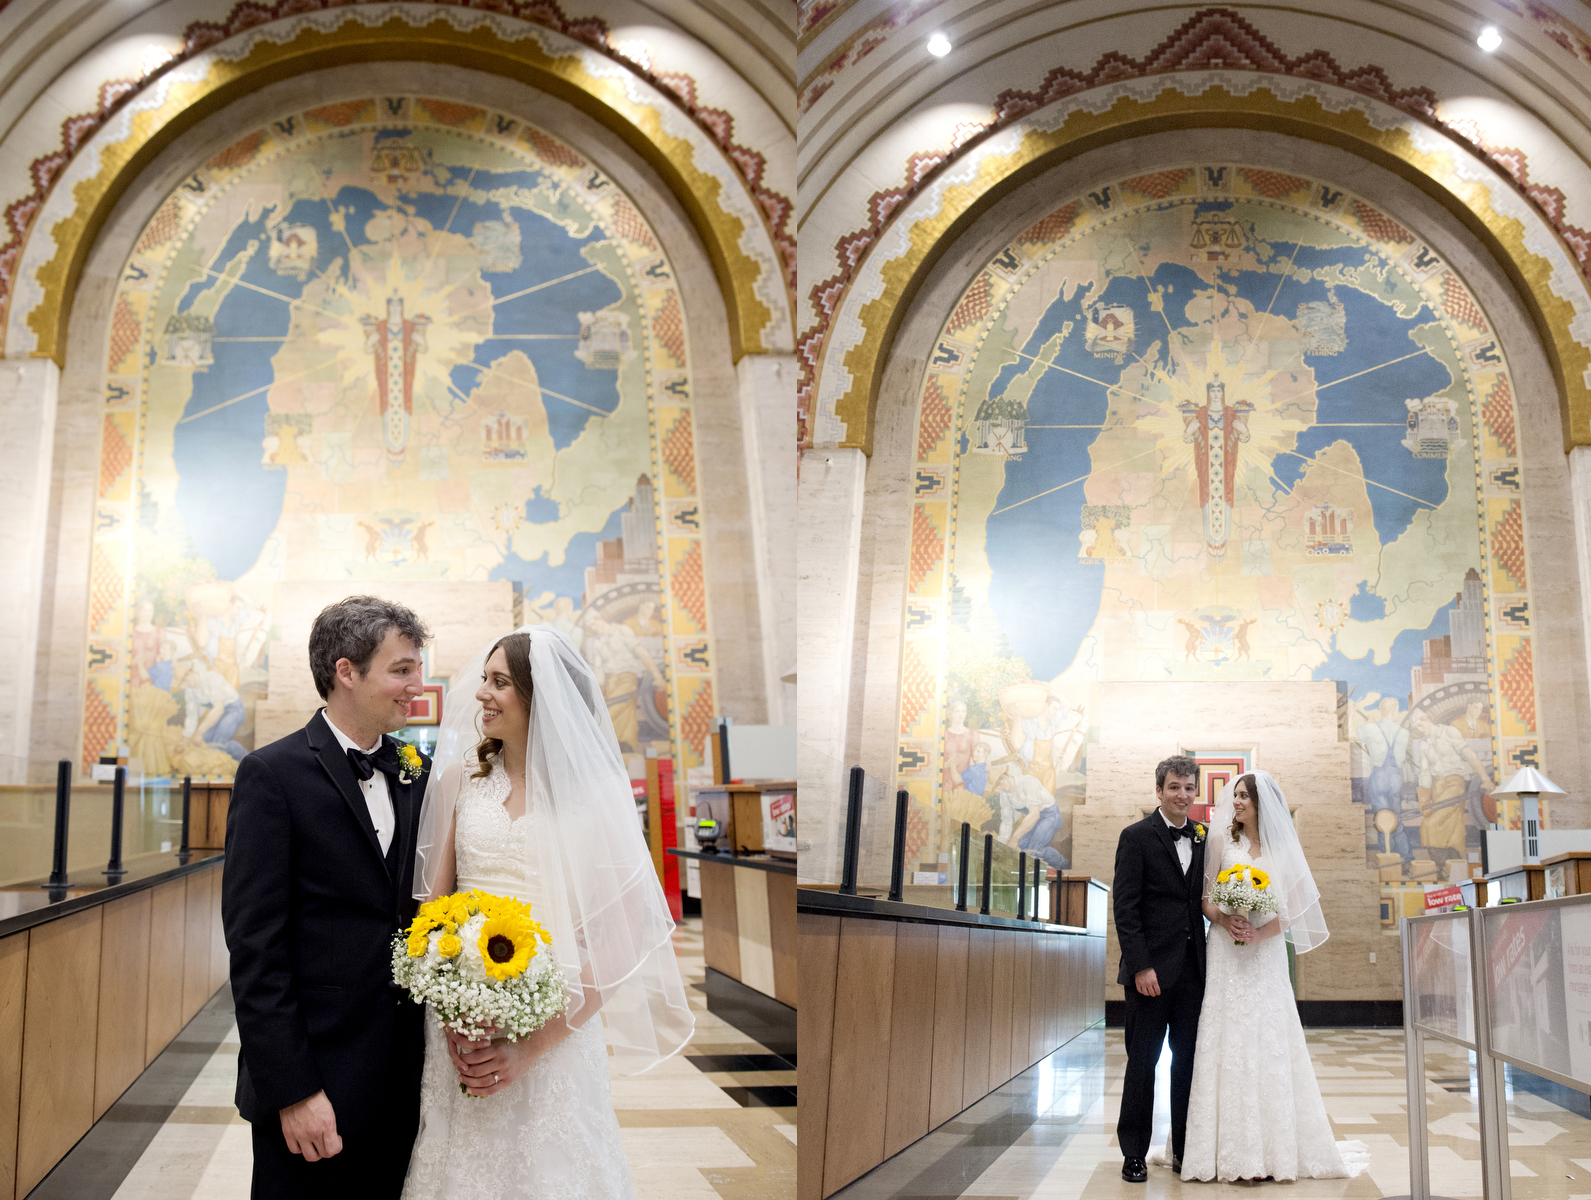 061116 WEDDING Daphna & Keith 33.JPG